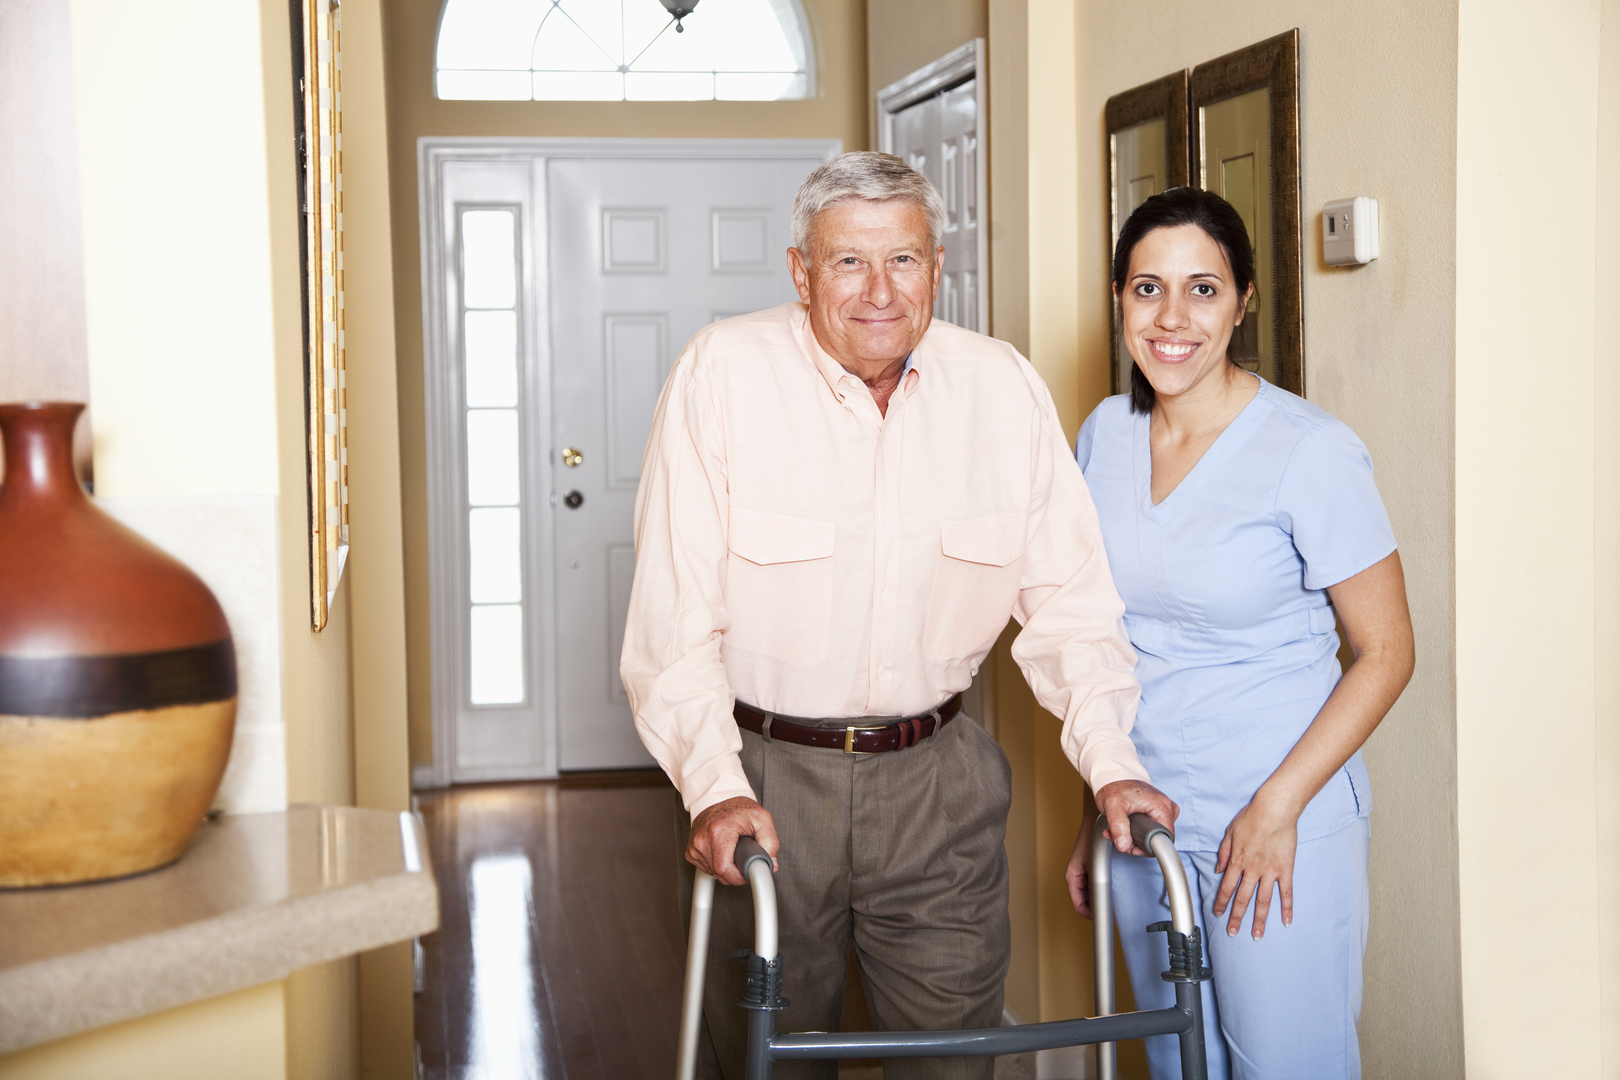 Leelin Home Health Care Home Health Care Services Nurse